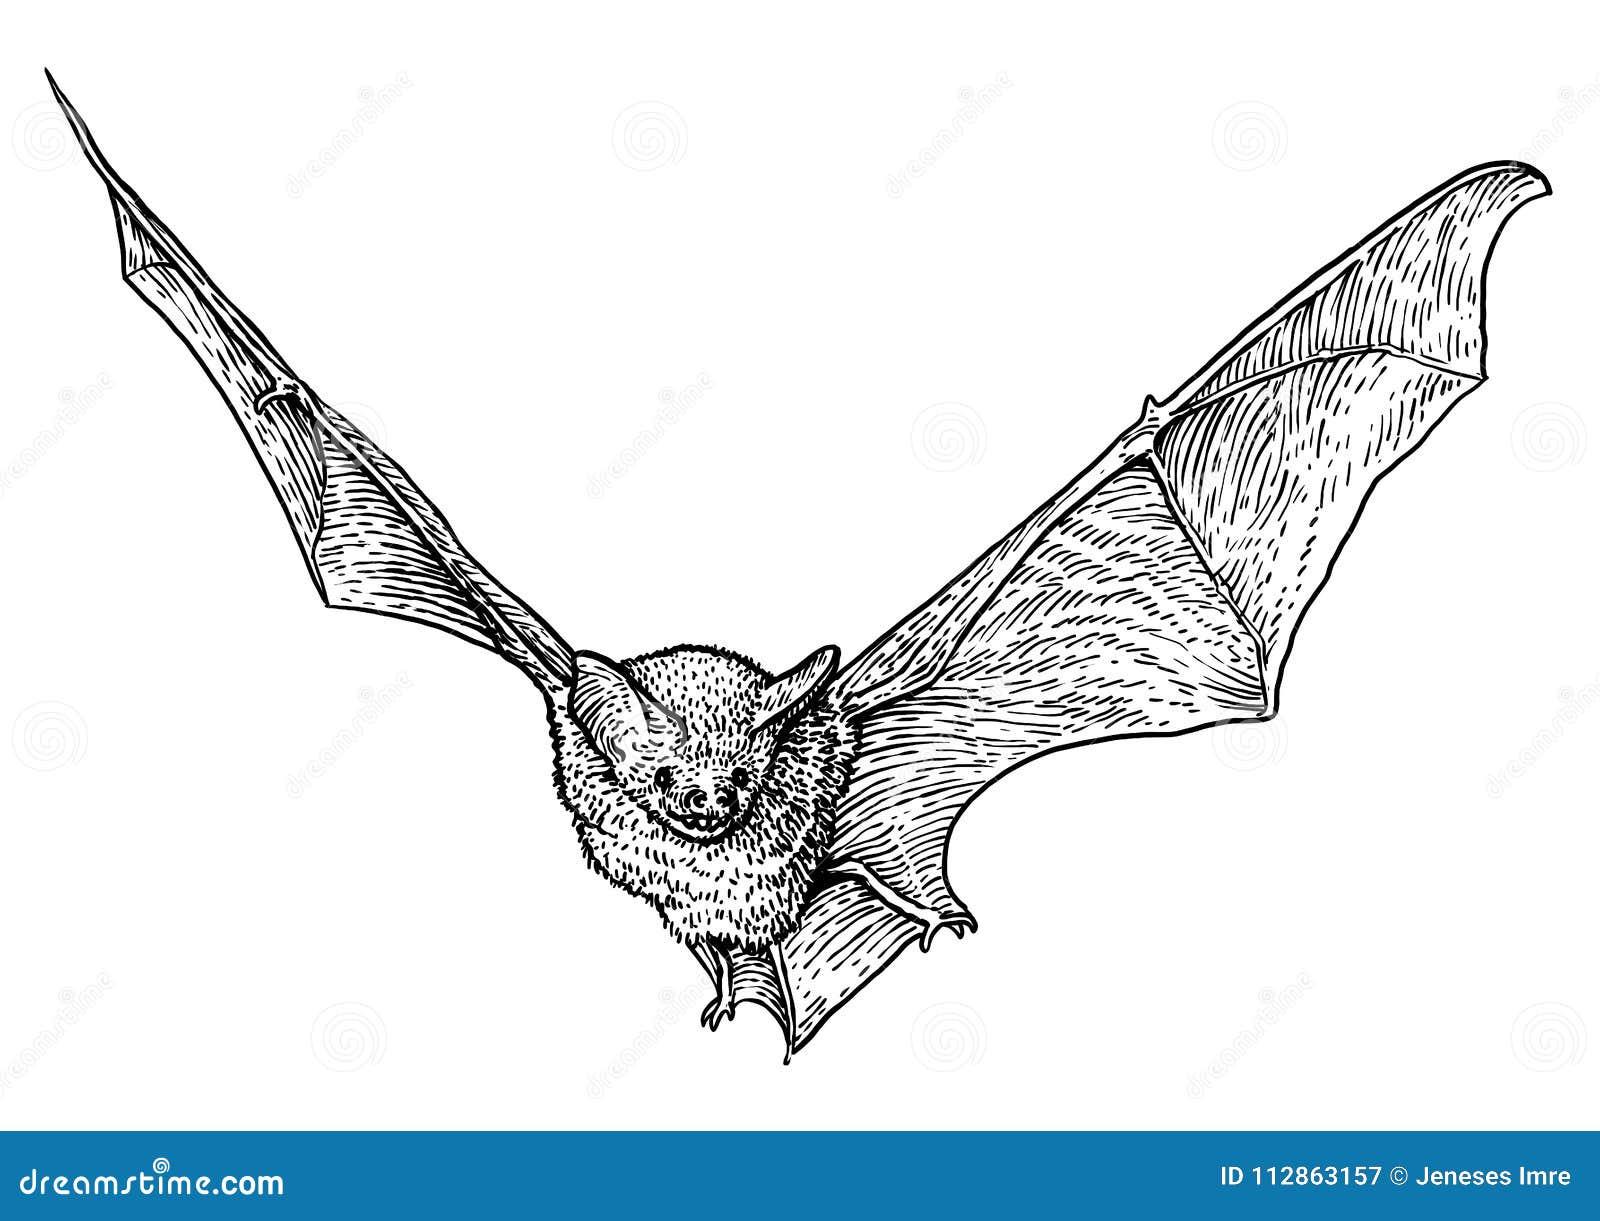 Bat illustration drawing engraving ink line art vector stock